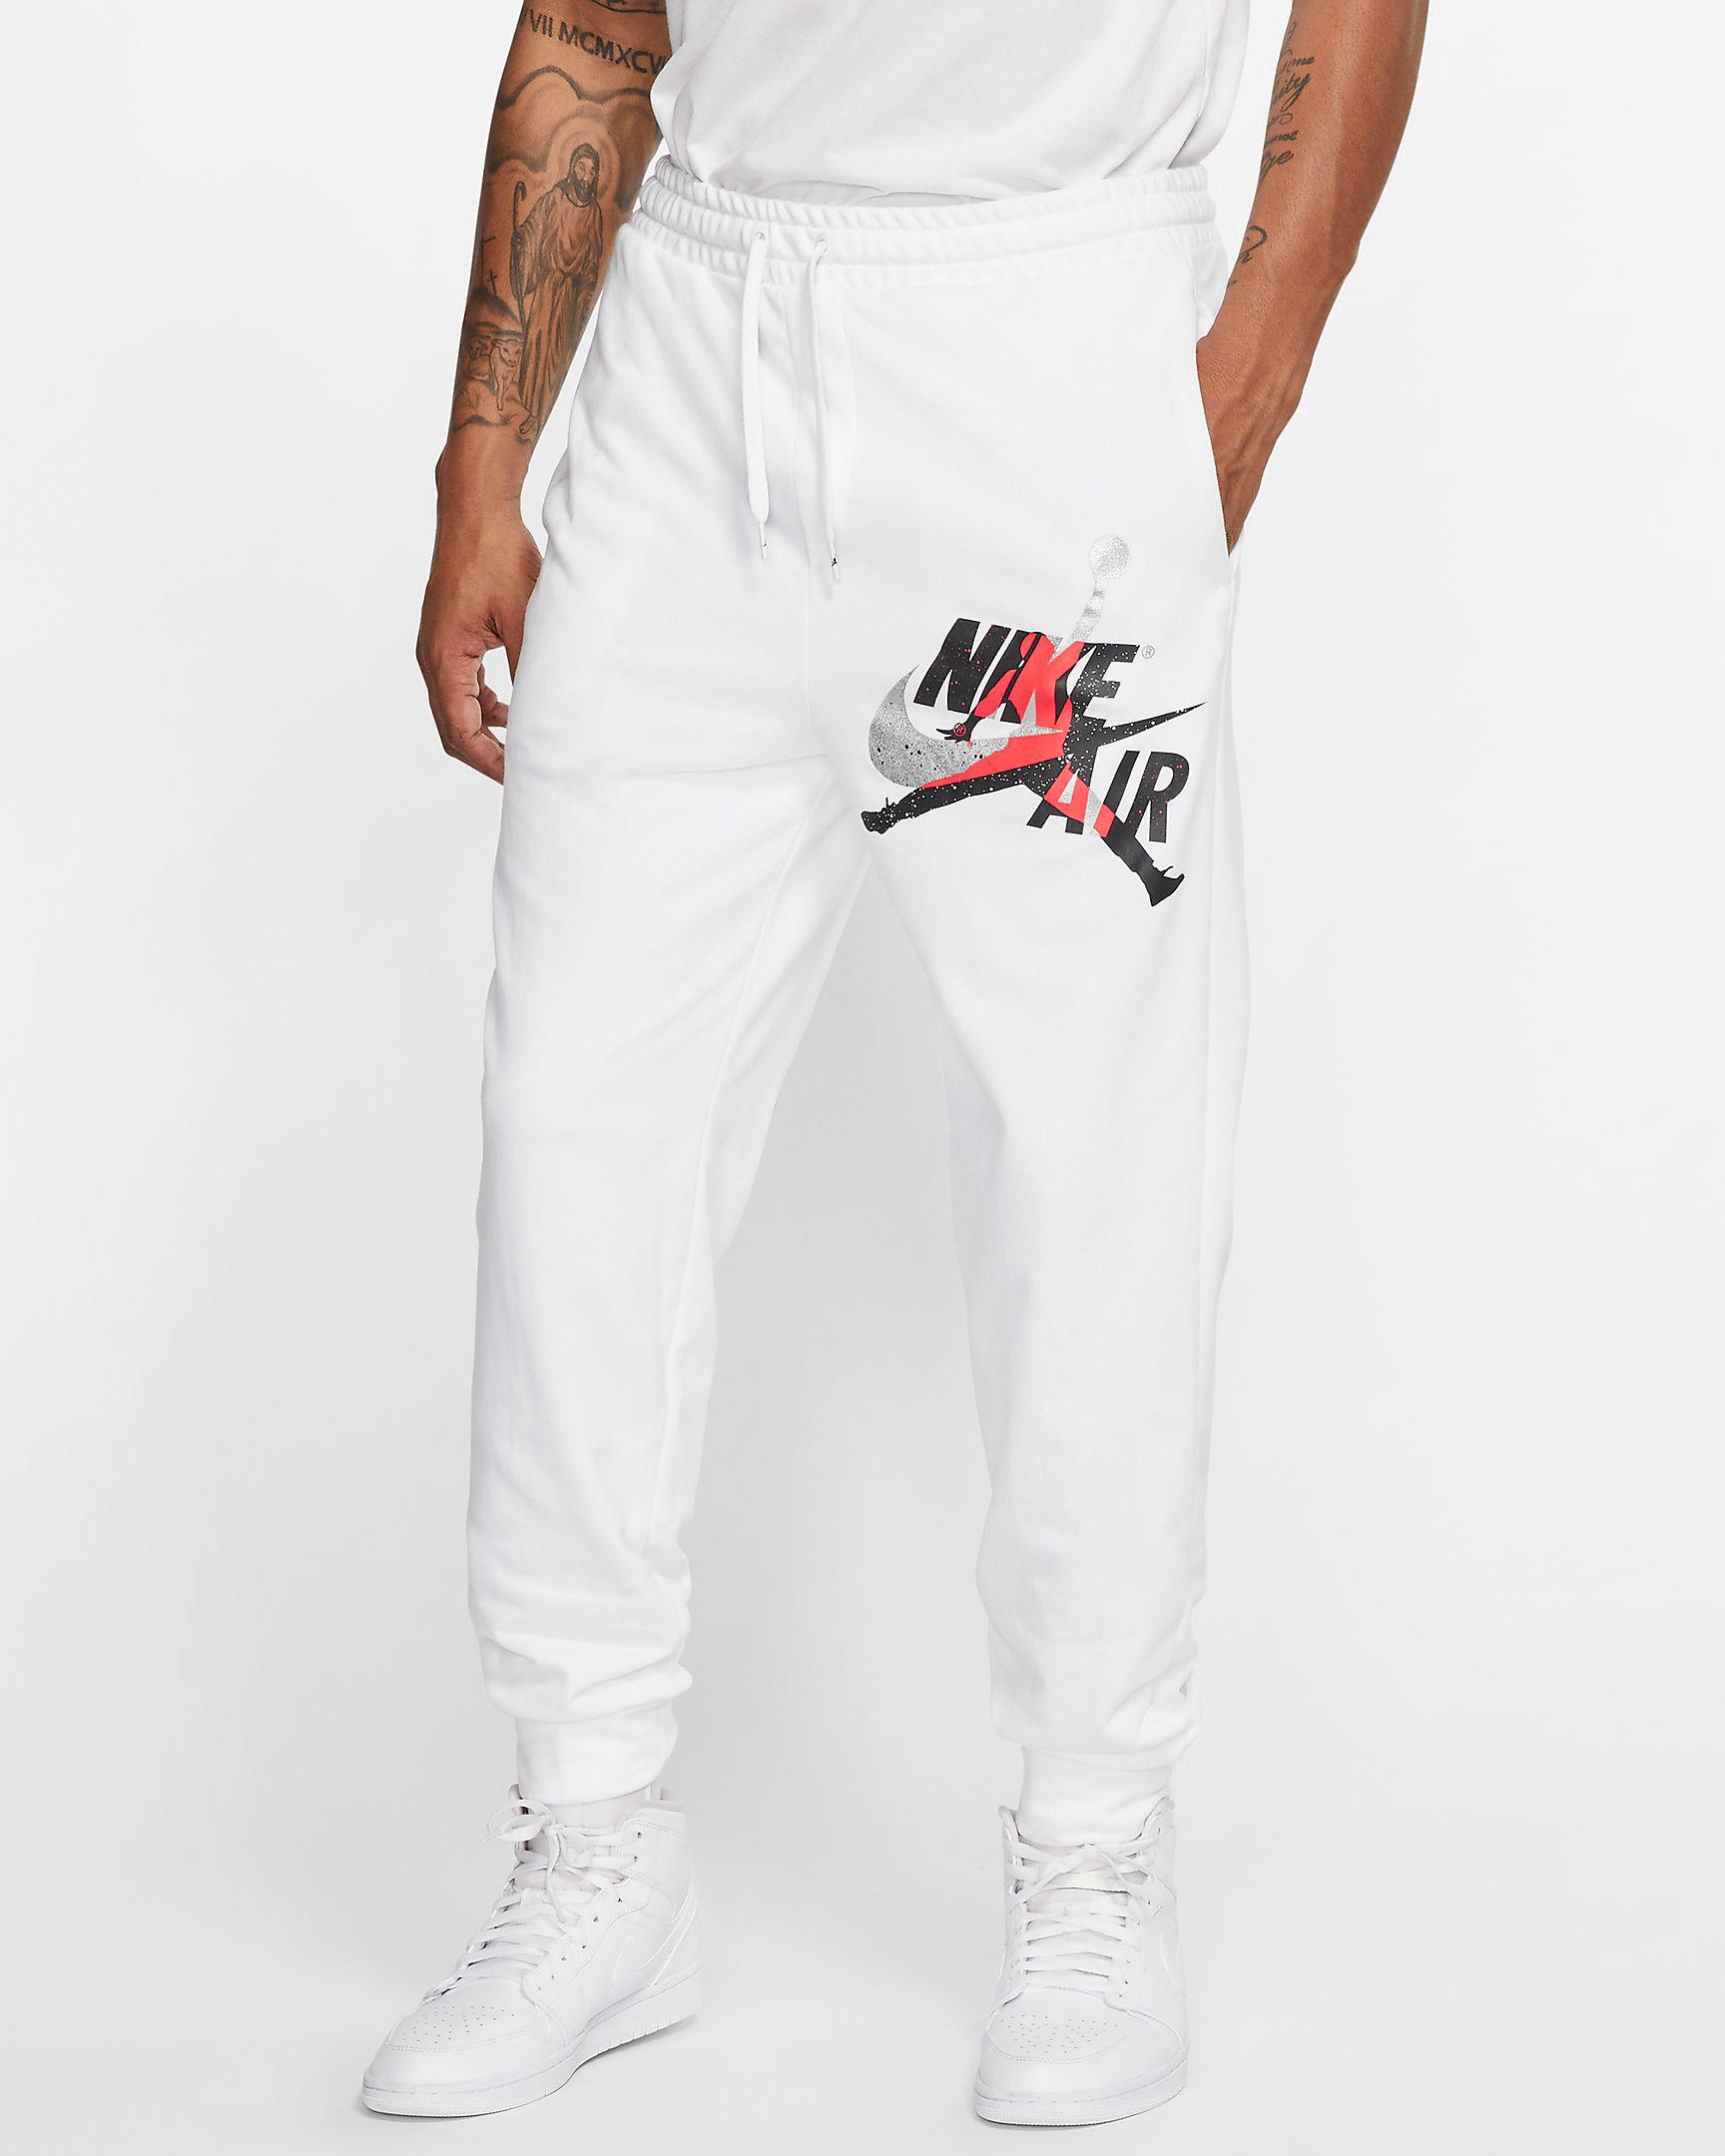 jordan-jumpman-classics-jogger-pants-infrared-black-silver-2